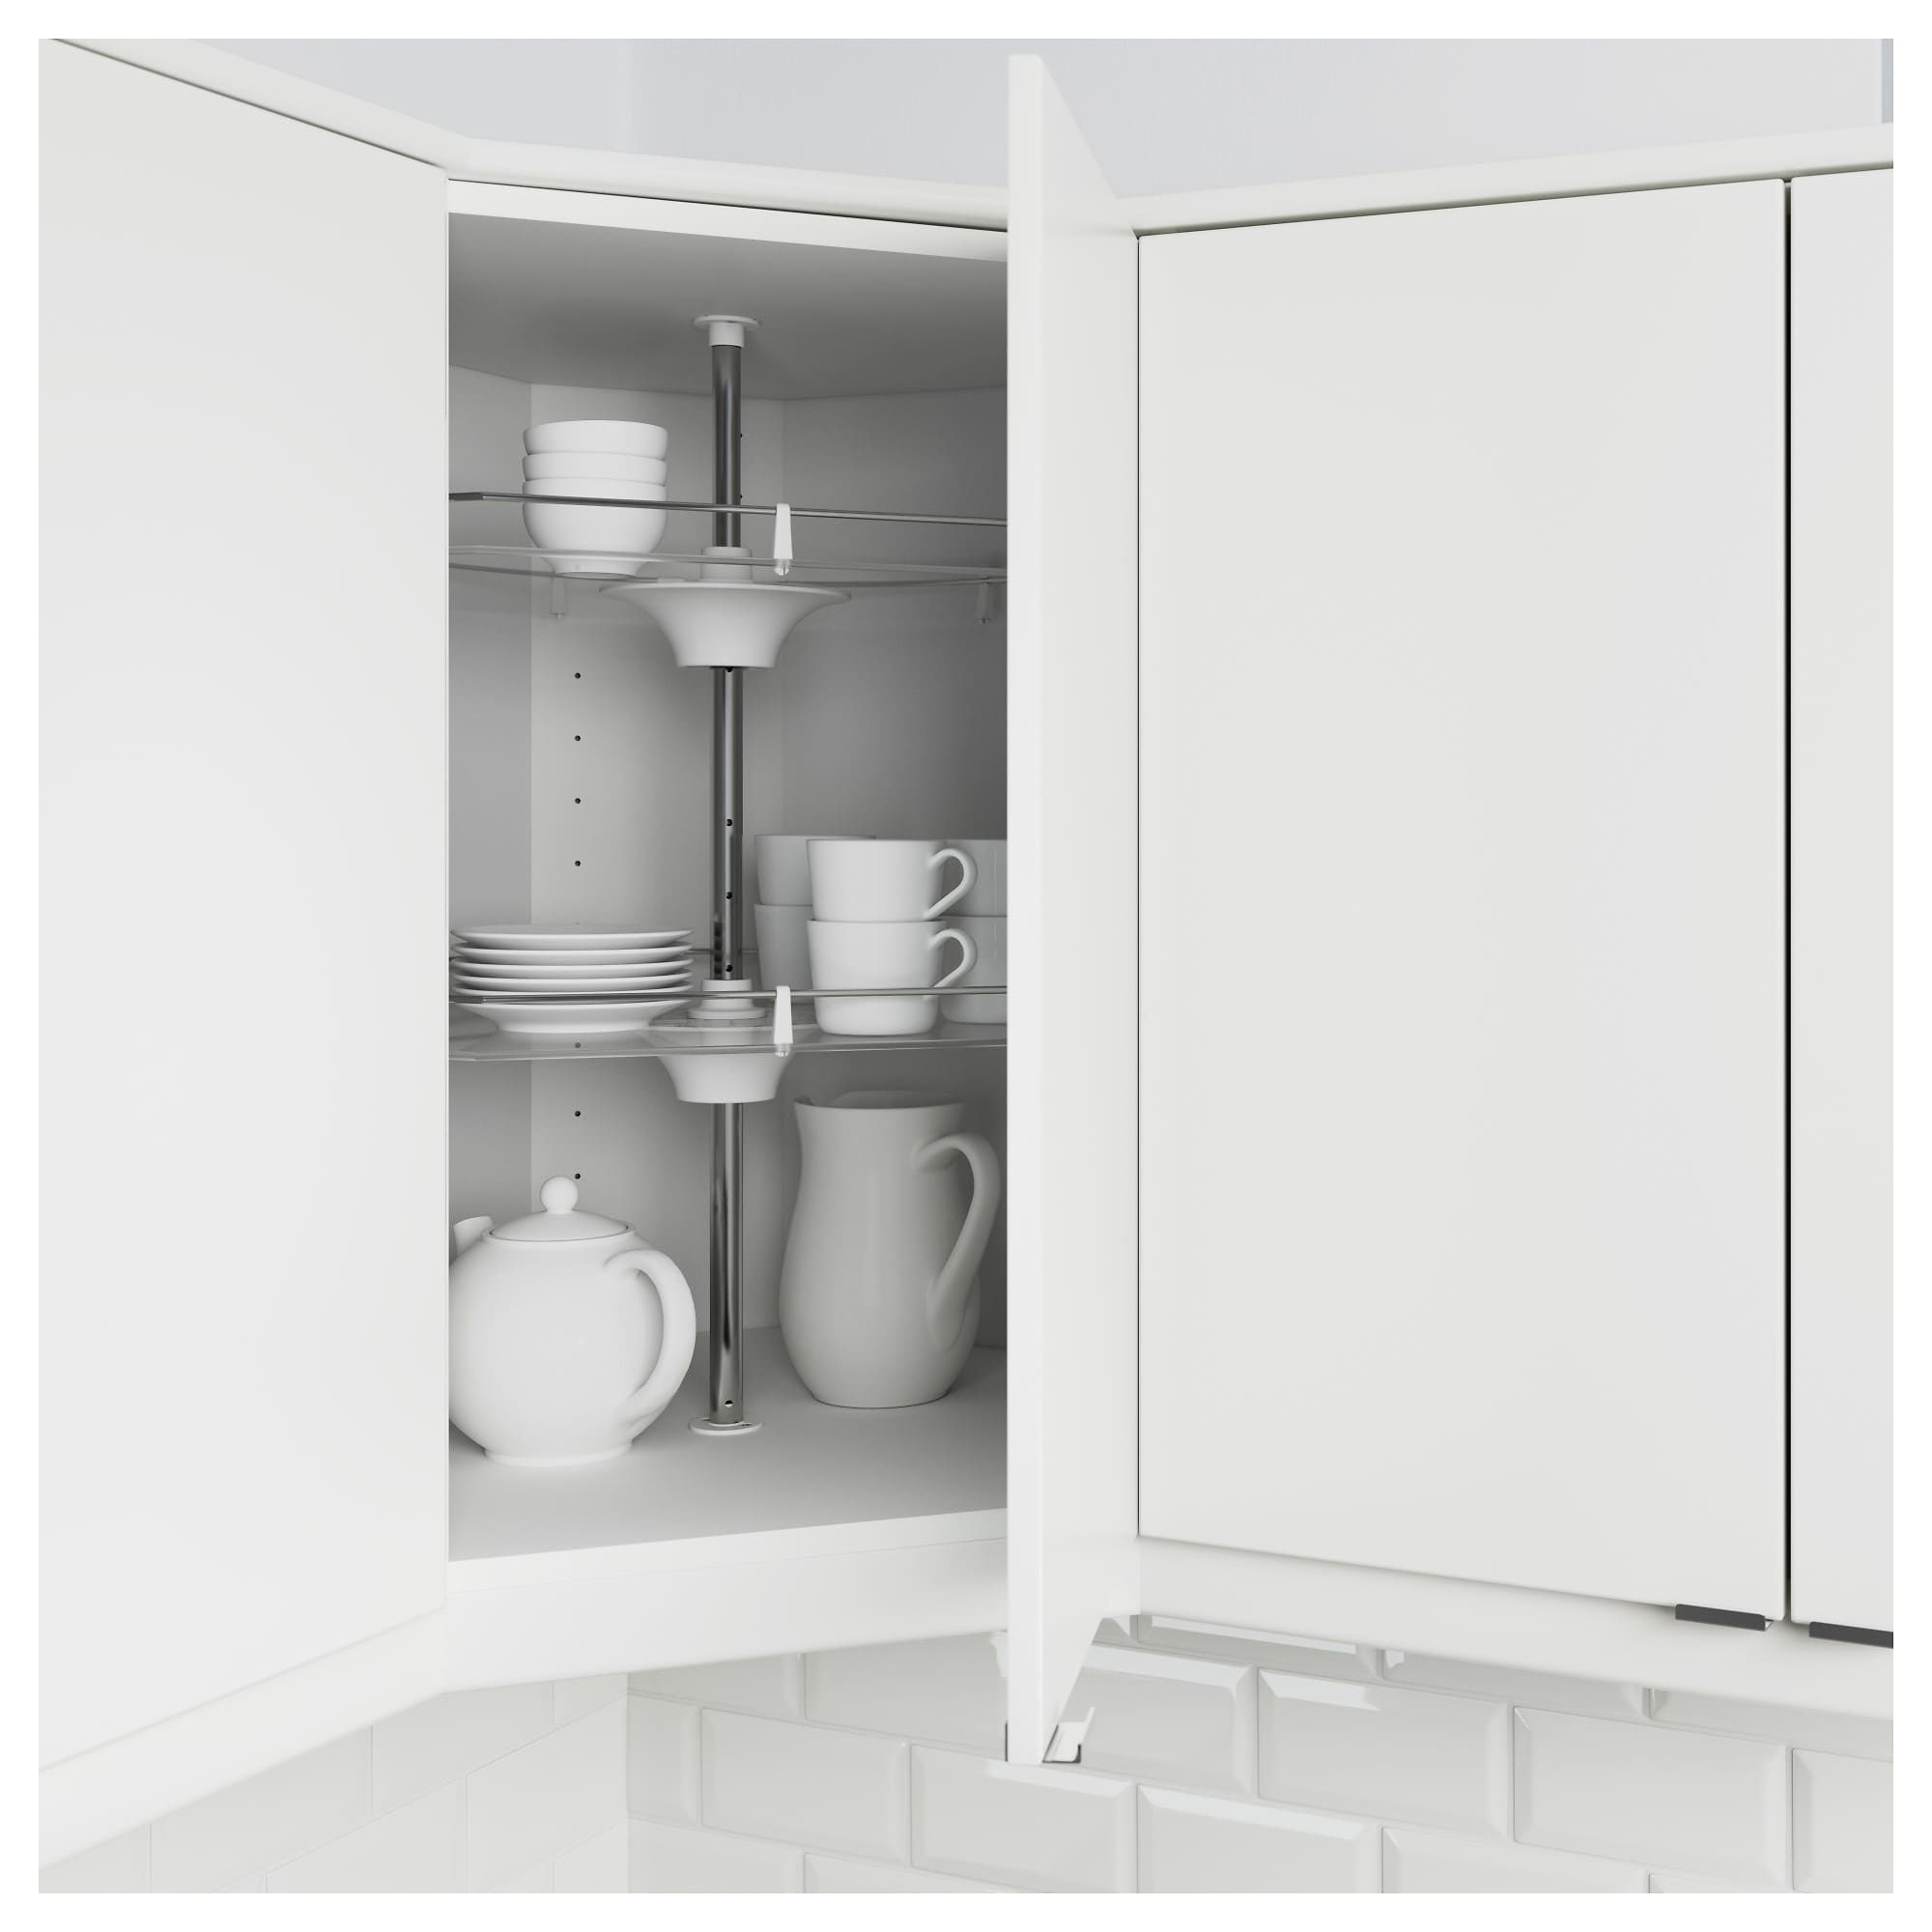 Utrusta Wall Corner Cabinet Carousel Ikea Ikea Kitchen Cabinets Kitchen Wall Cabinets Corner Cabinet